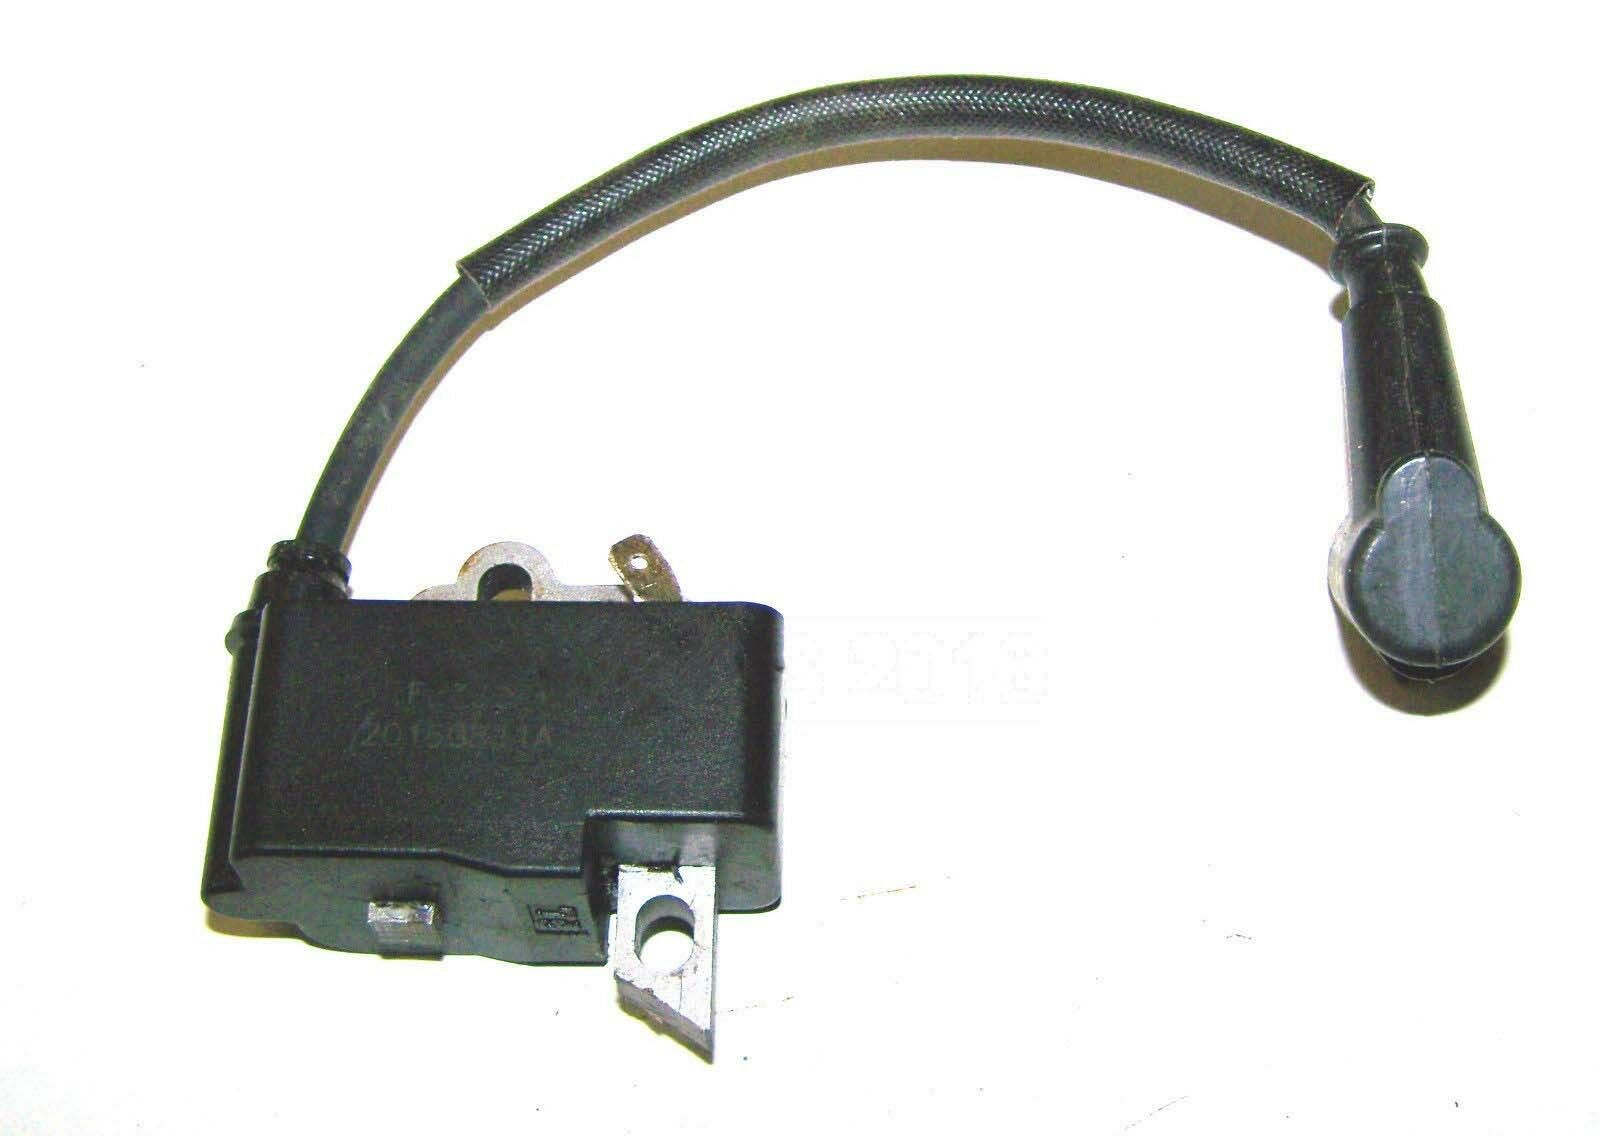 Compatible con Stihl MS362 MS362C Bobina De Encendido Nuevo 1140 400 1302